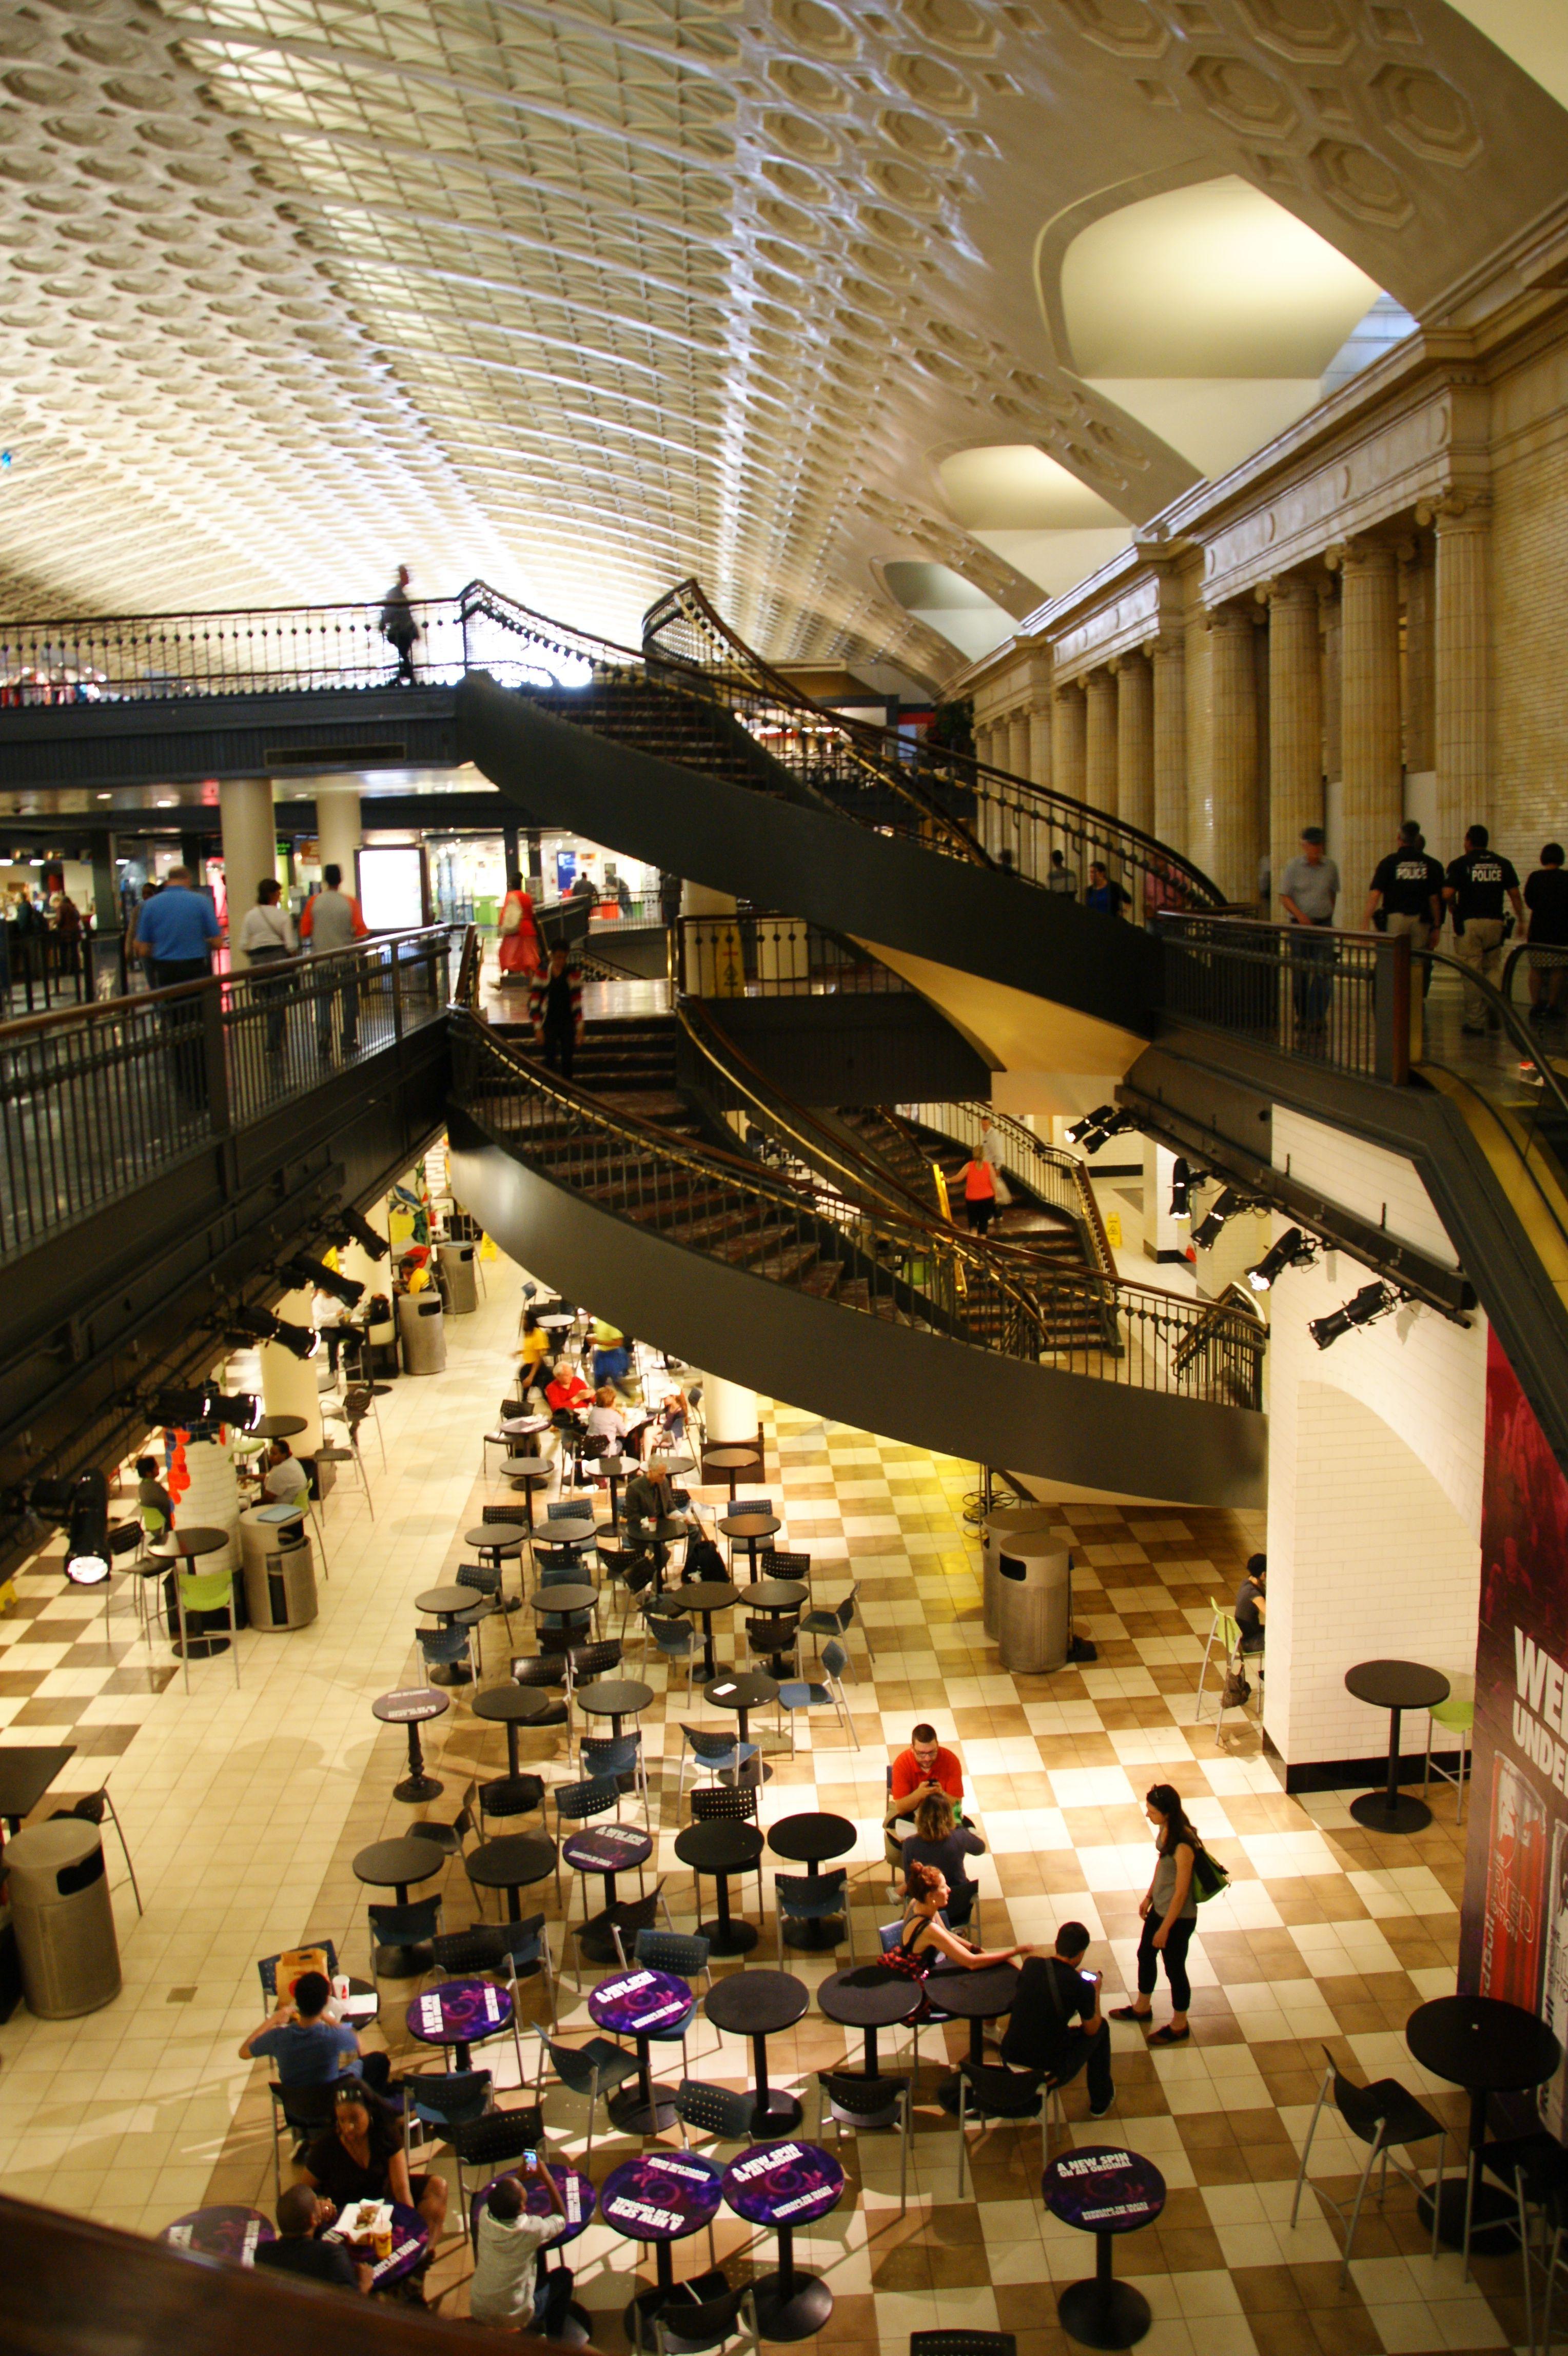 Union Station in Washington DC, D.C.